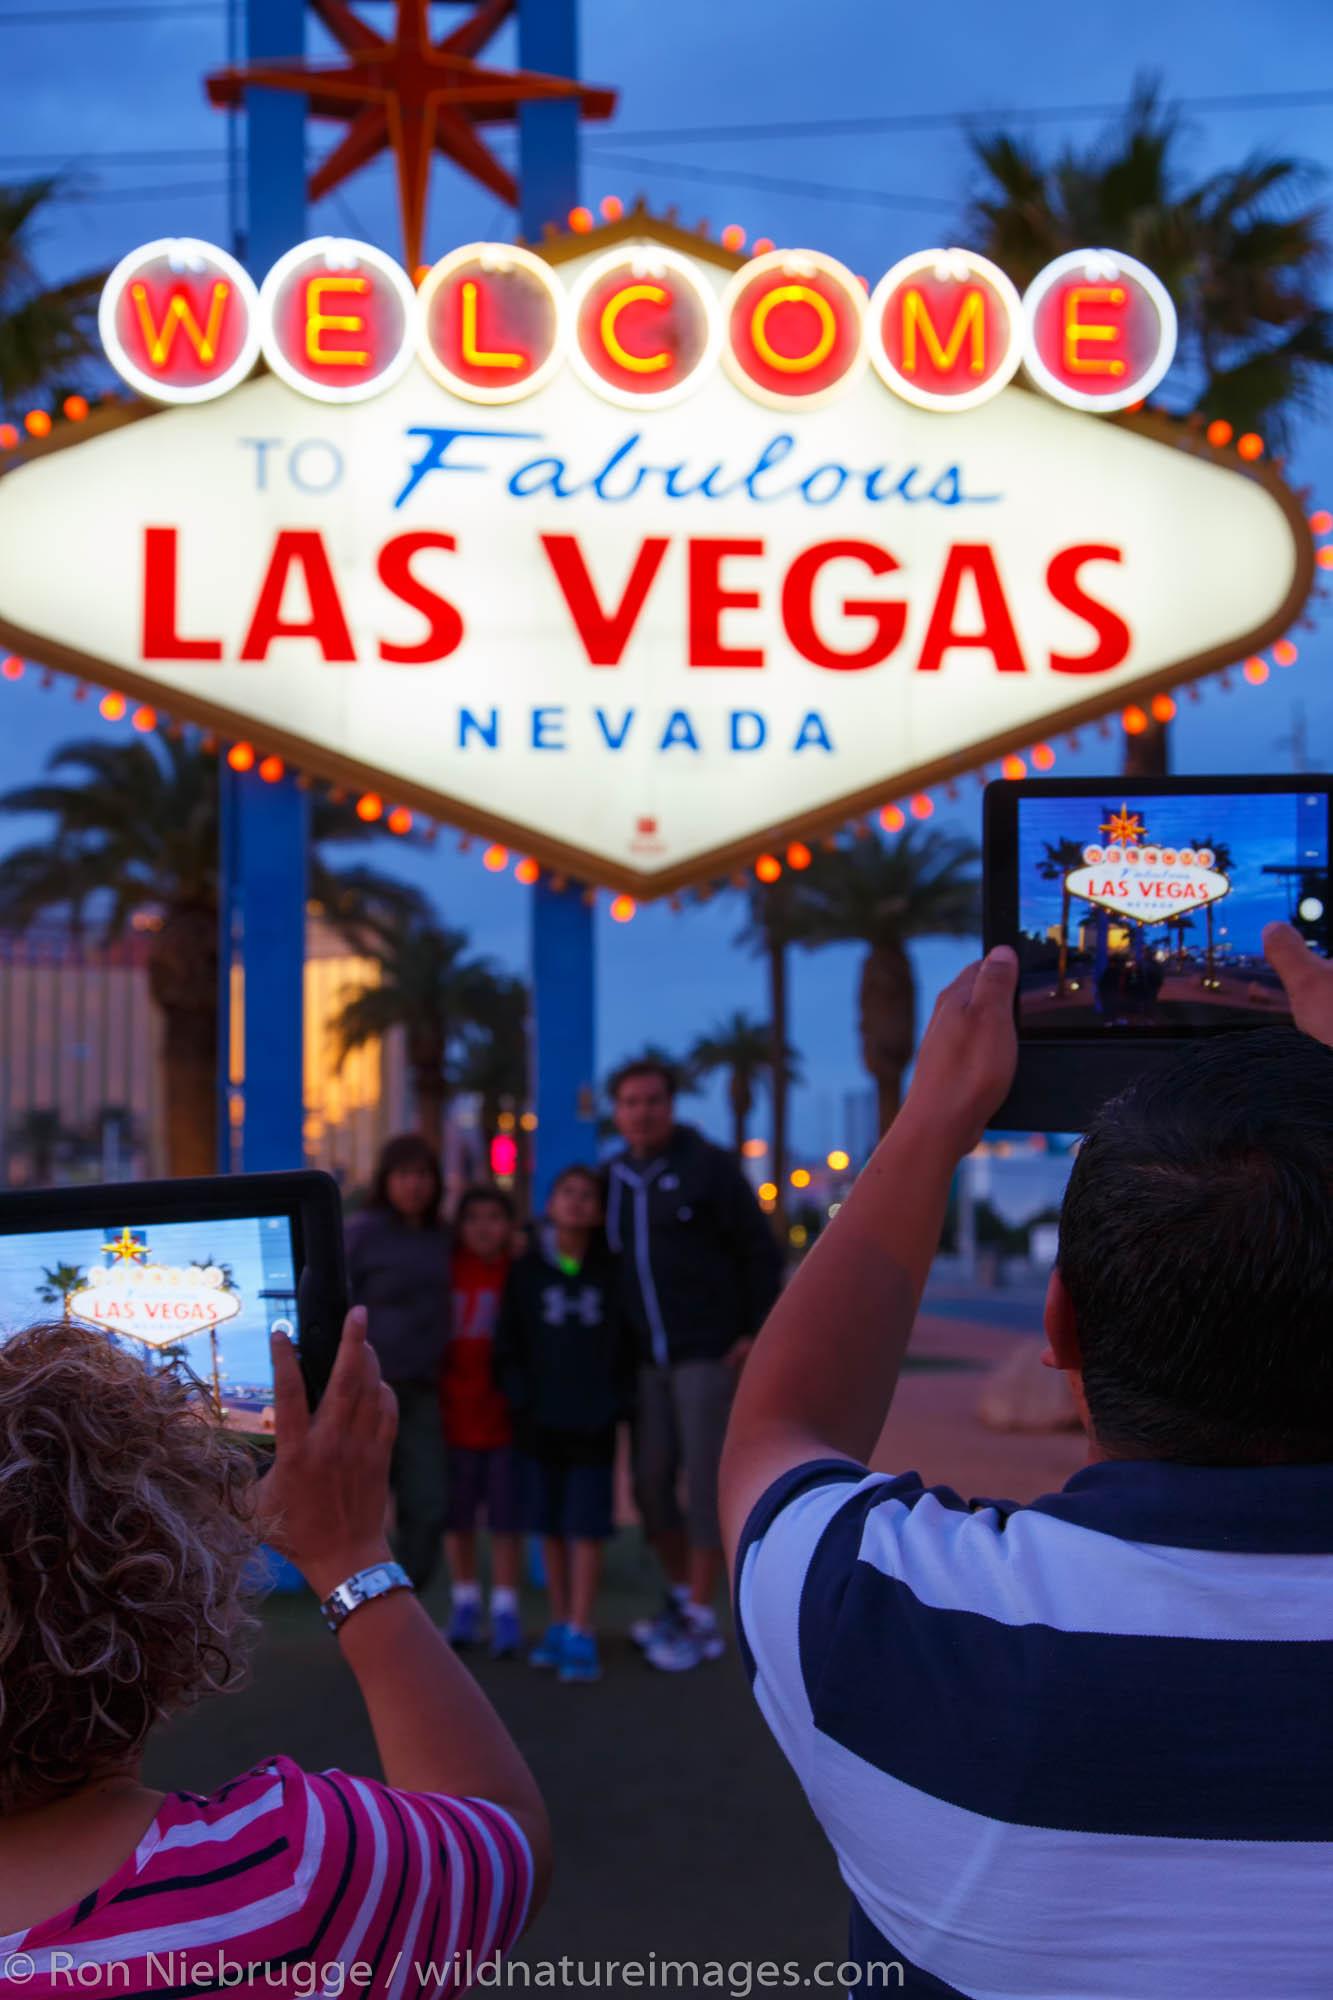 Tourists at Welcome to Las Vegas sign, Las Vegas, Nevada.